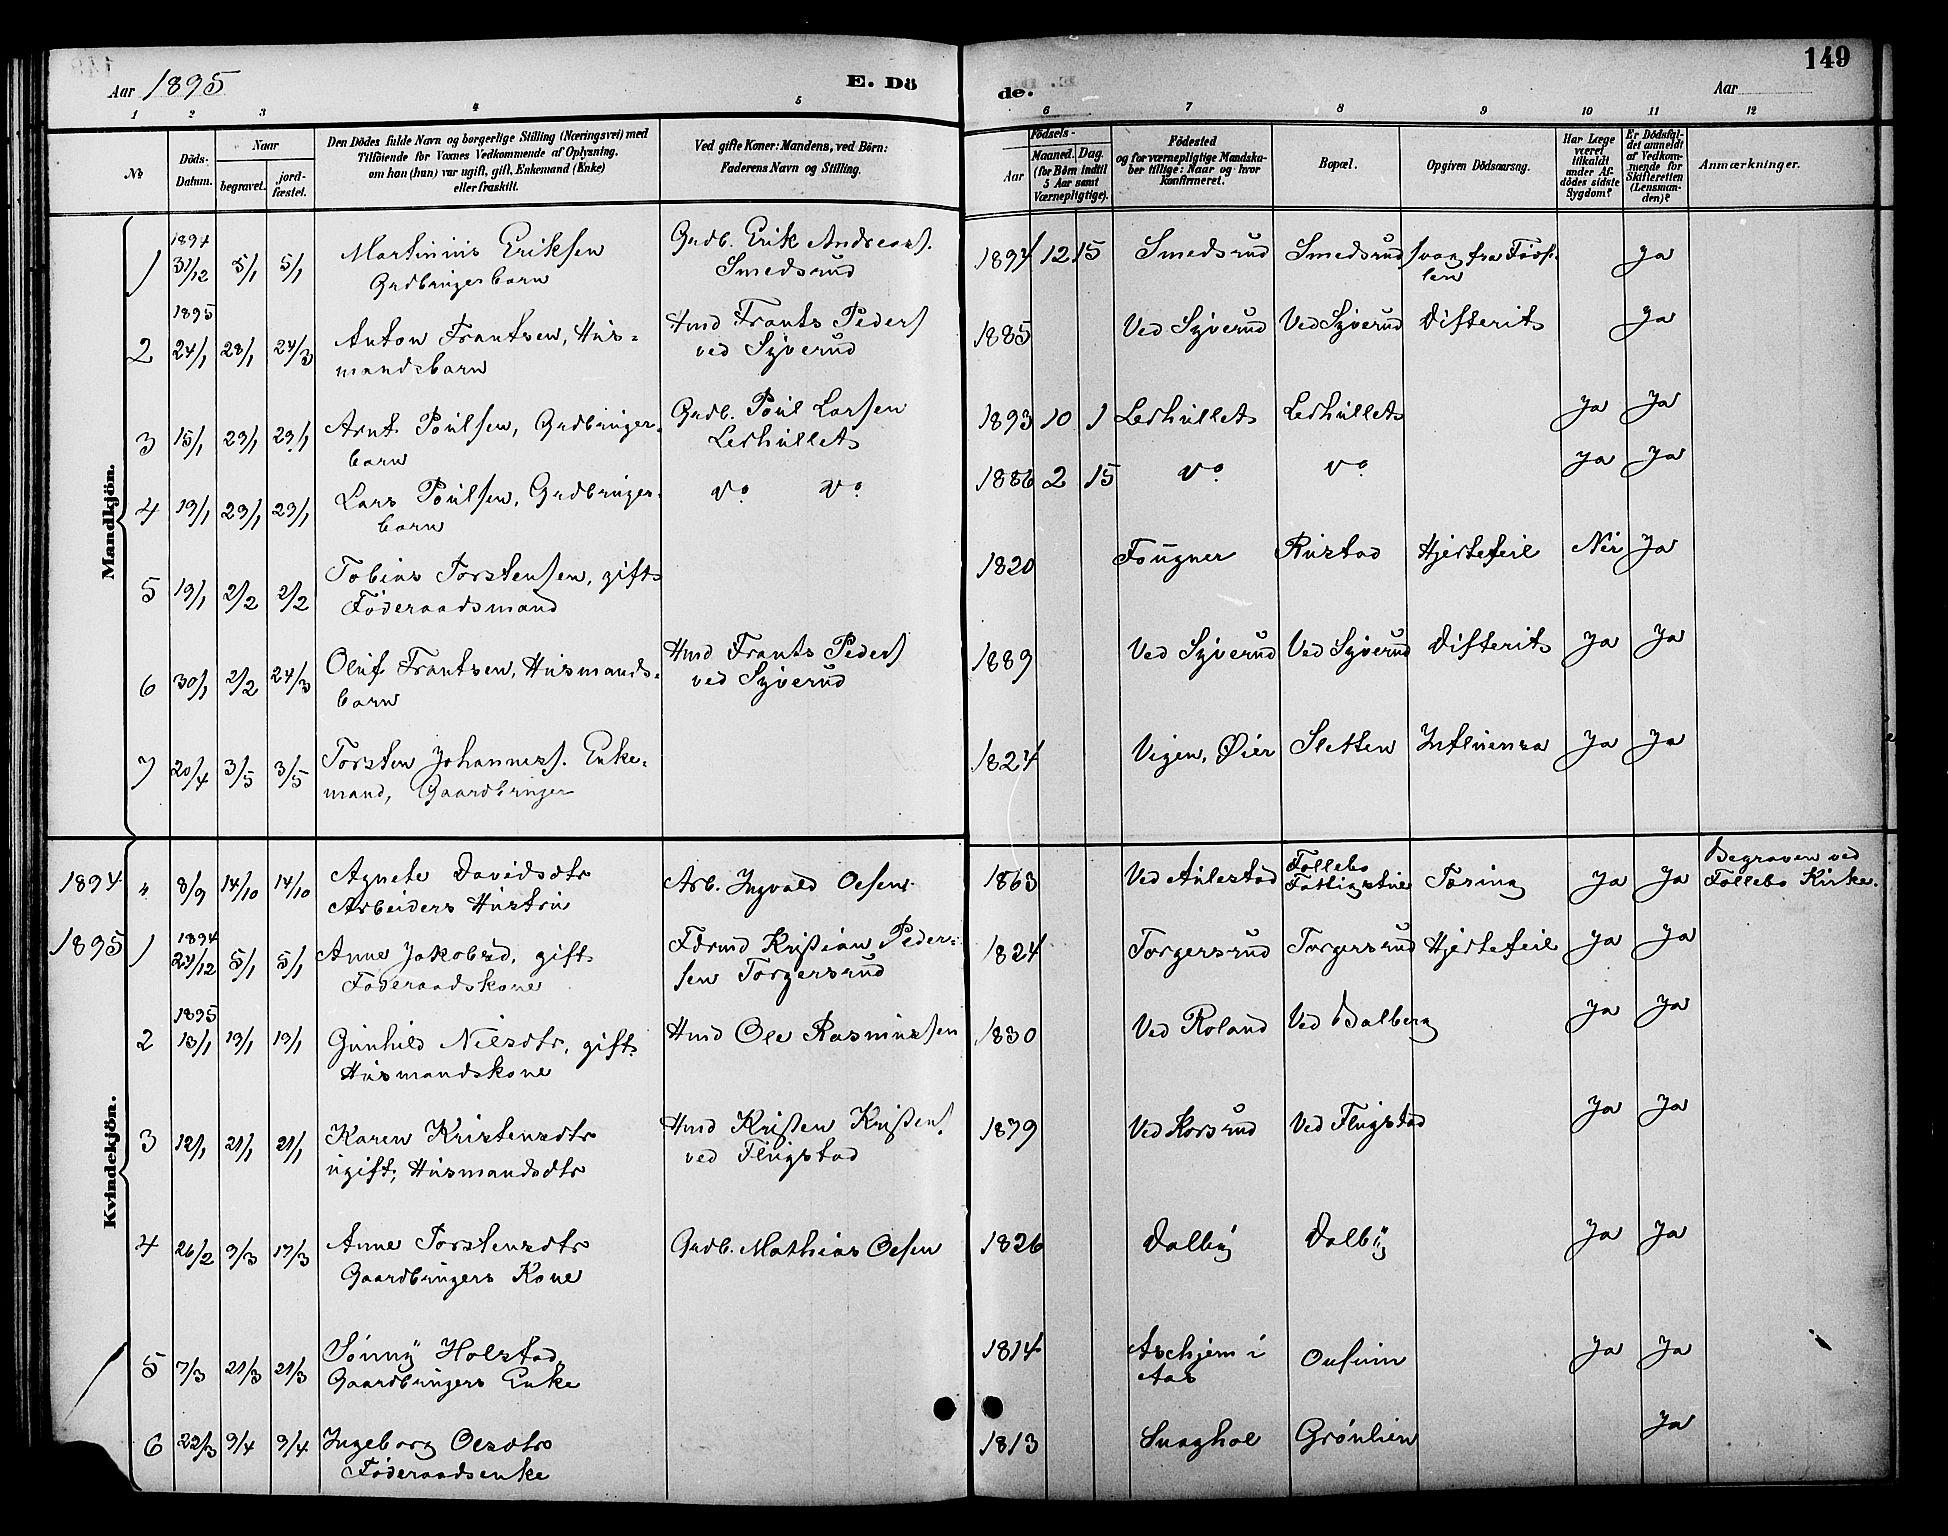 SAH, Fåberg prestekontor, Klokkerbok nr. 10, 1892-1900, s. 149